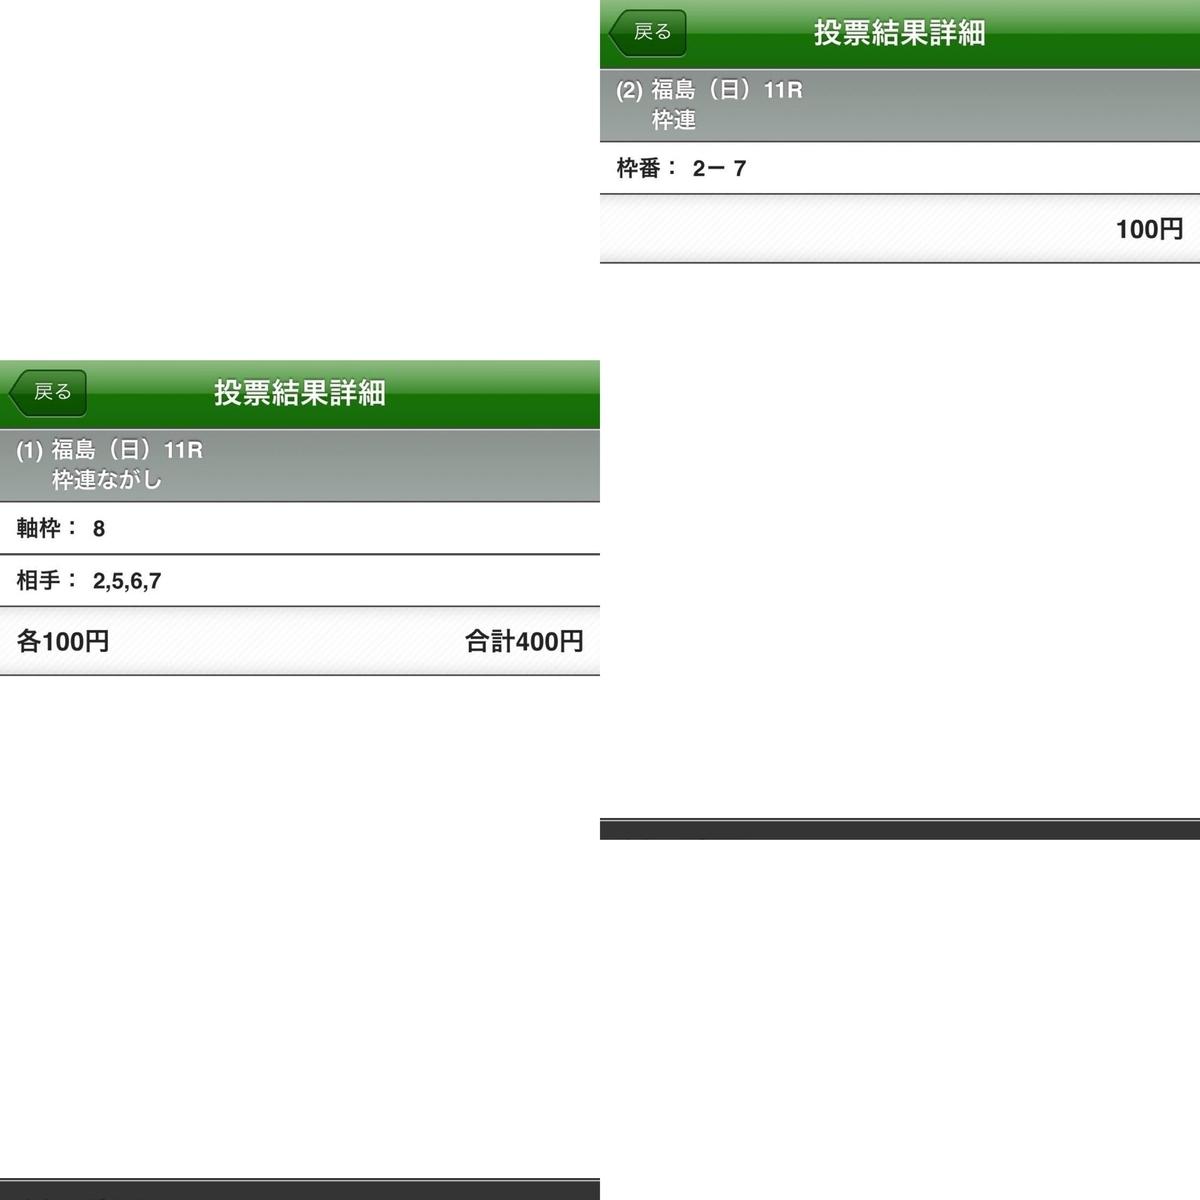 f:id:shigeppi:20200711212014j:plain